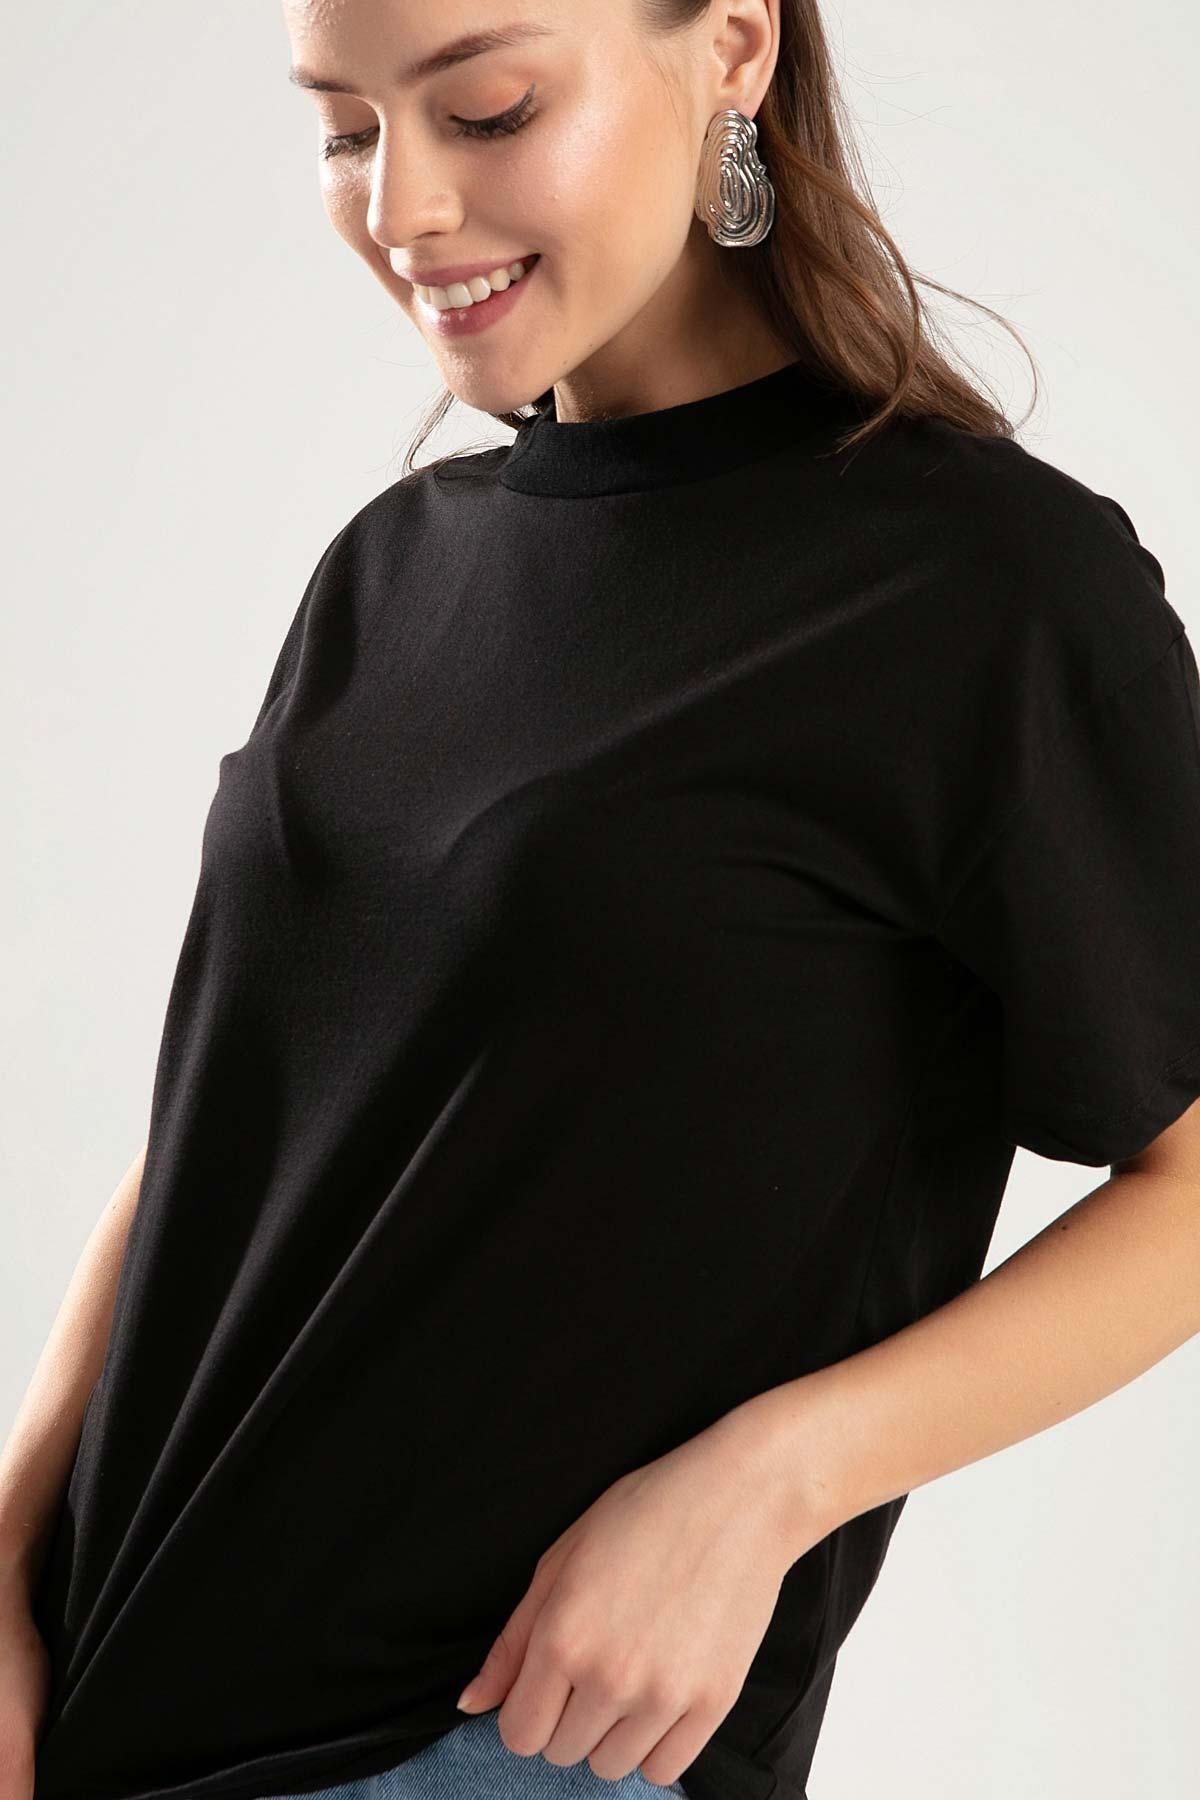 Pattaya Kadın Siyah Dik Yaka Basic Tişört PTTY20S-701 2